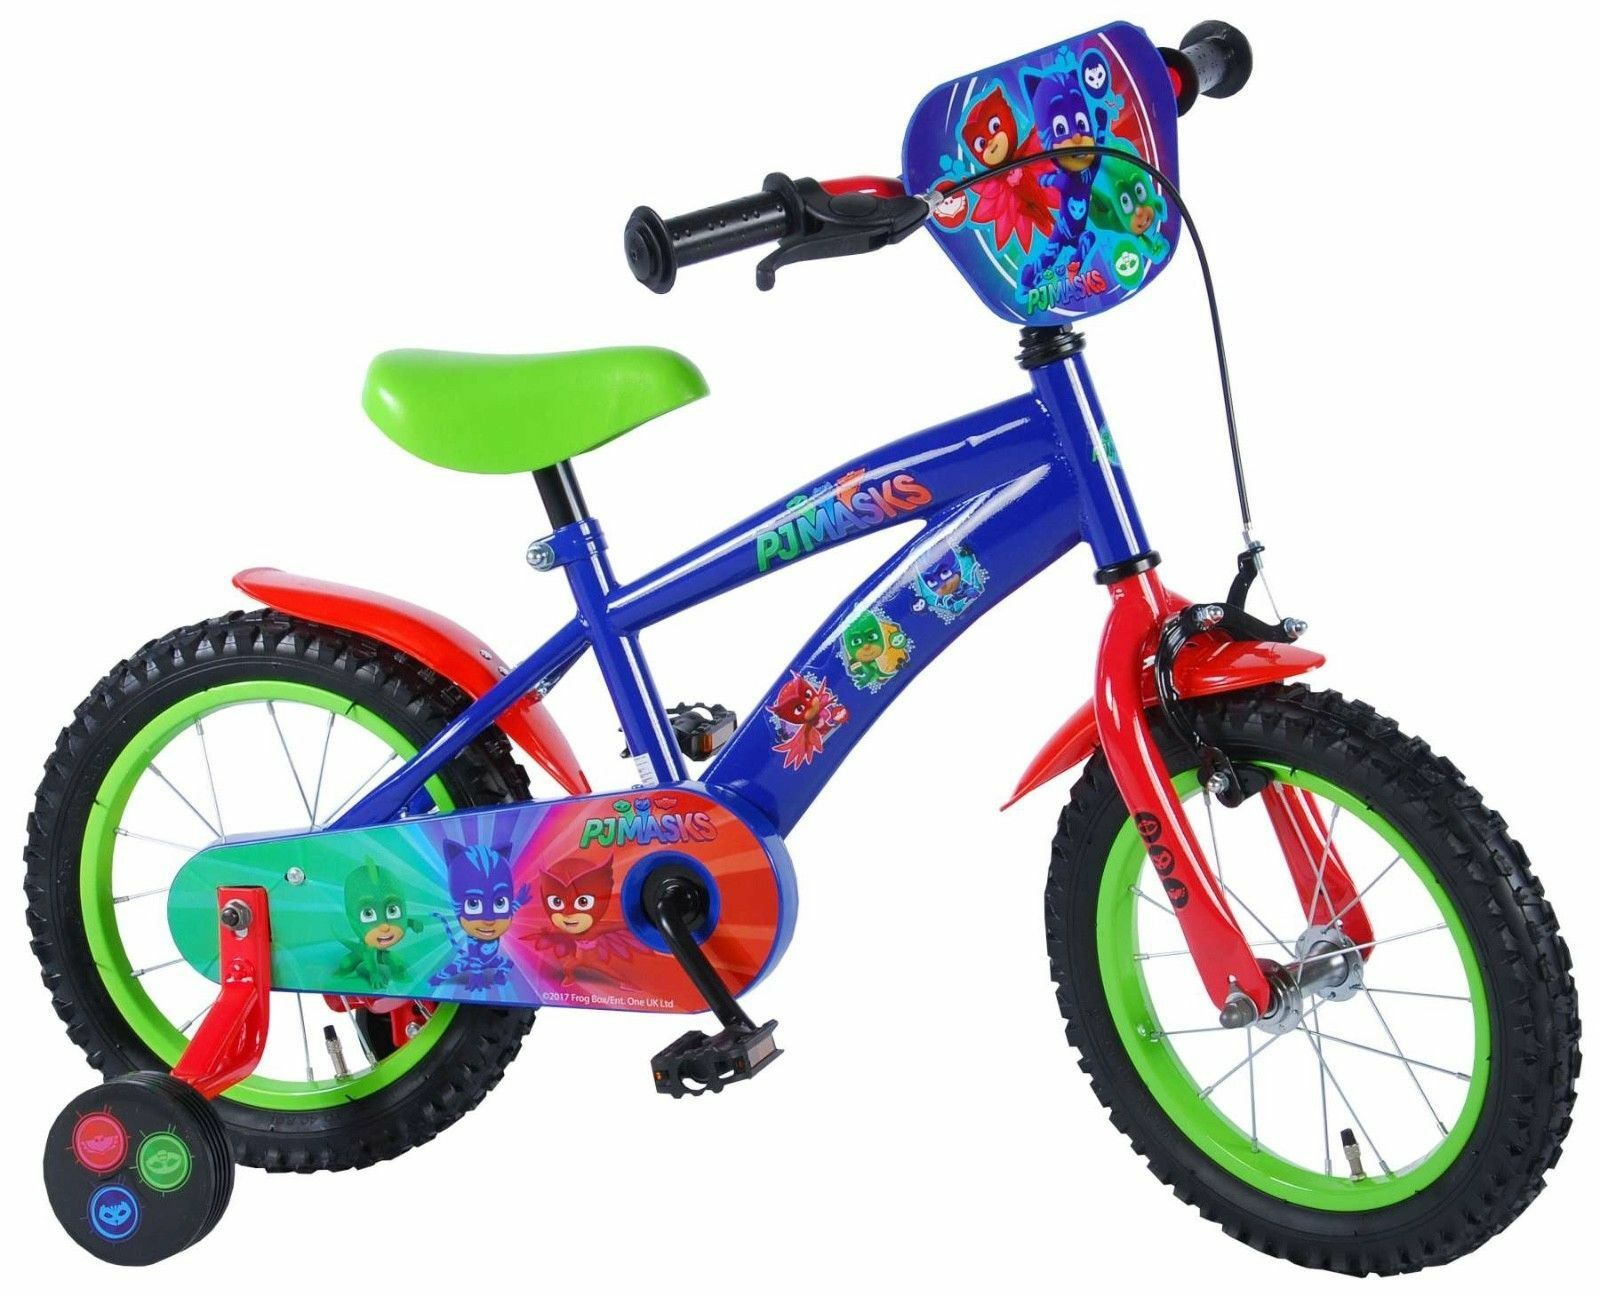 PJ Masks Kinderfahrrad 14 Zoll Fahrrad mit Stützräder Jungen Mädchen 71463